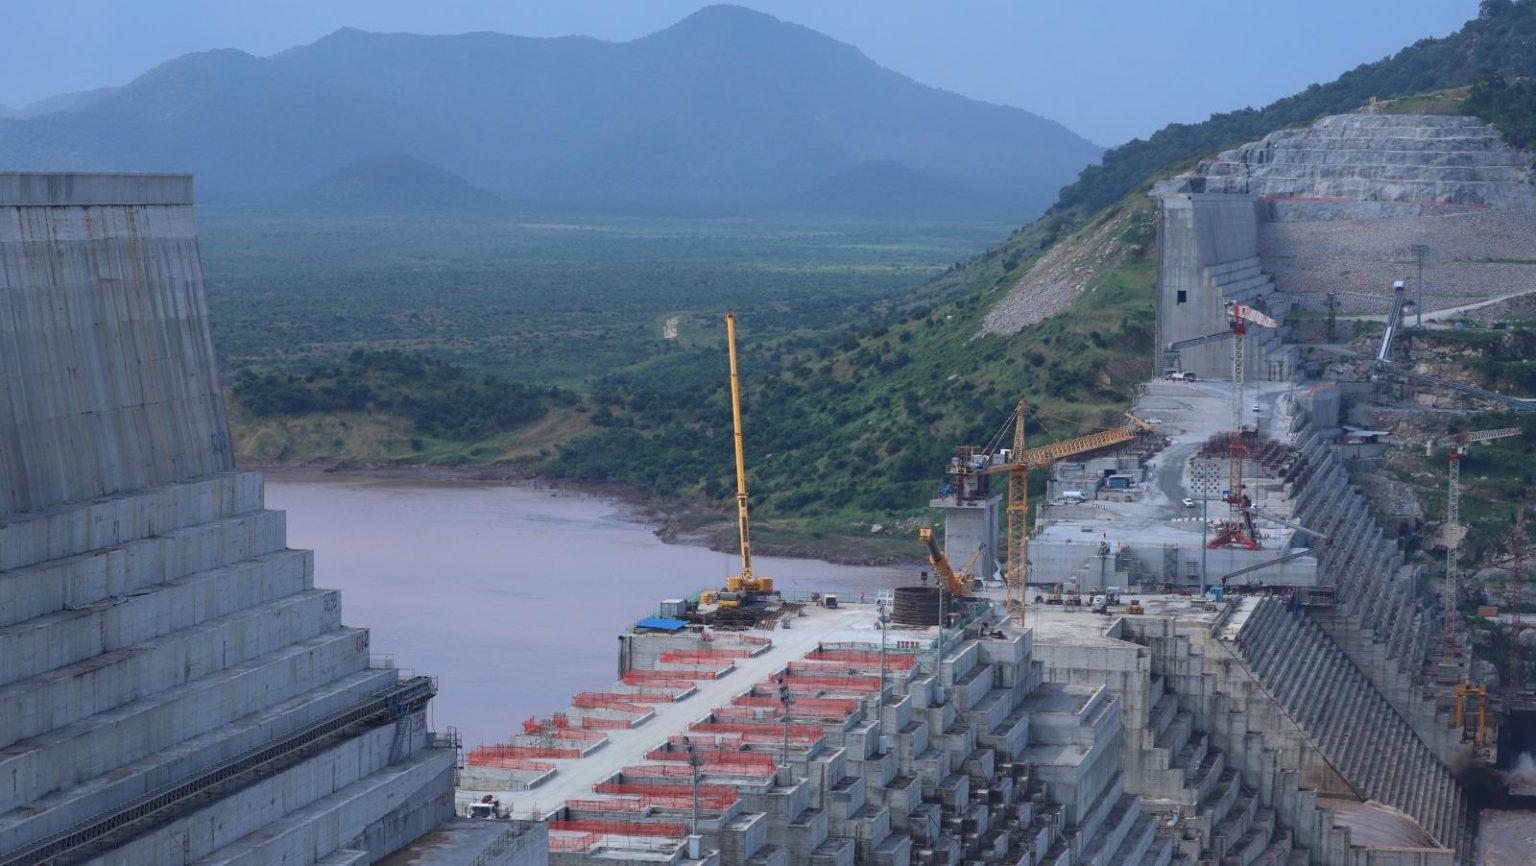 https://www.newsclick.in/sites/default/files/2020-07/Grand-Ethiopian-Renaissance-Dam-GERD-1536x866.jpg